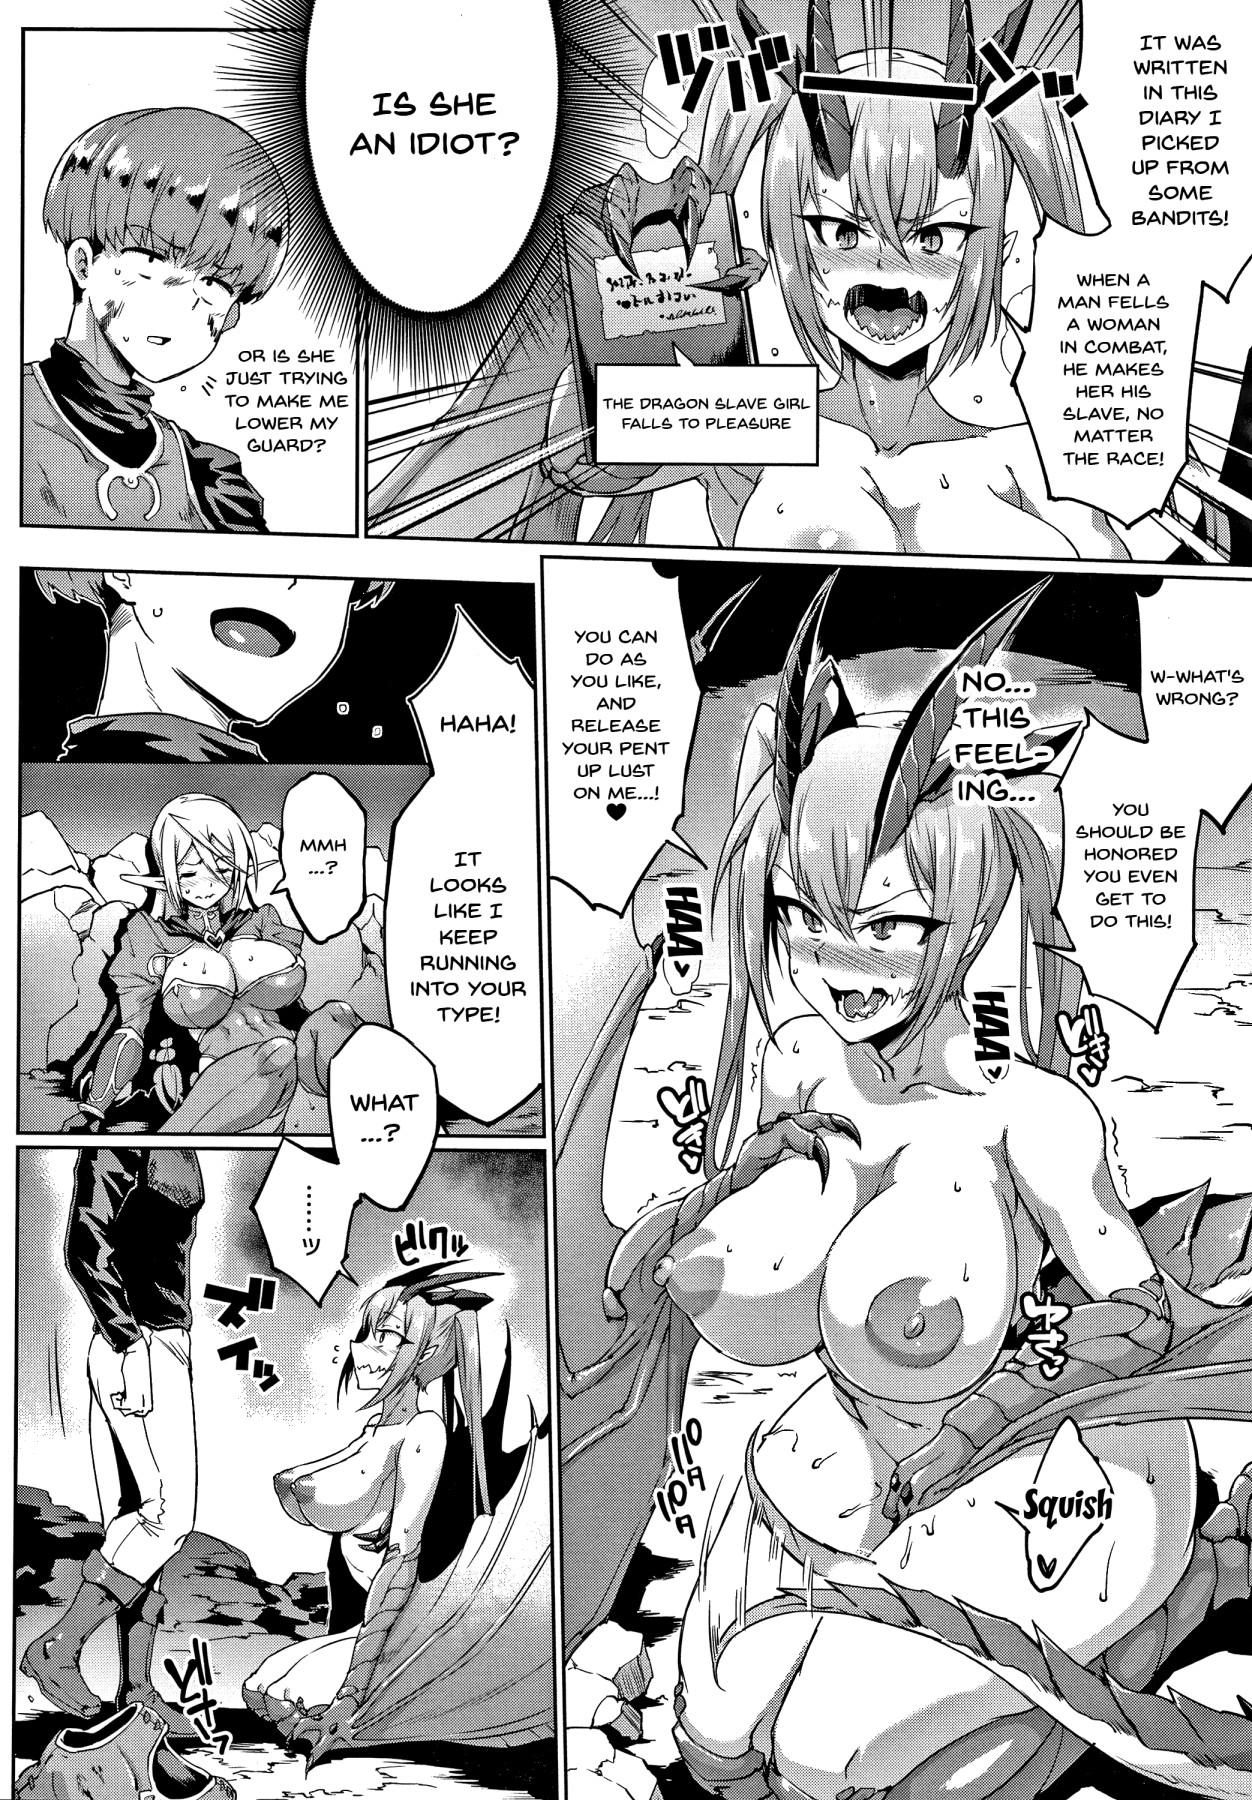 [Fan no Hitori] Sennen Reijou ~ My Lady, My Master ~  Ch.1-3 [English] {Doujins.com} 60